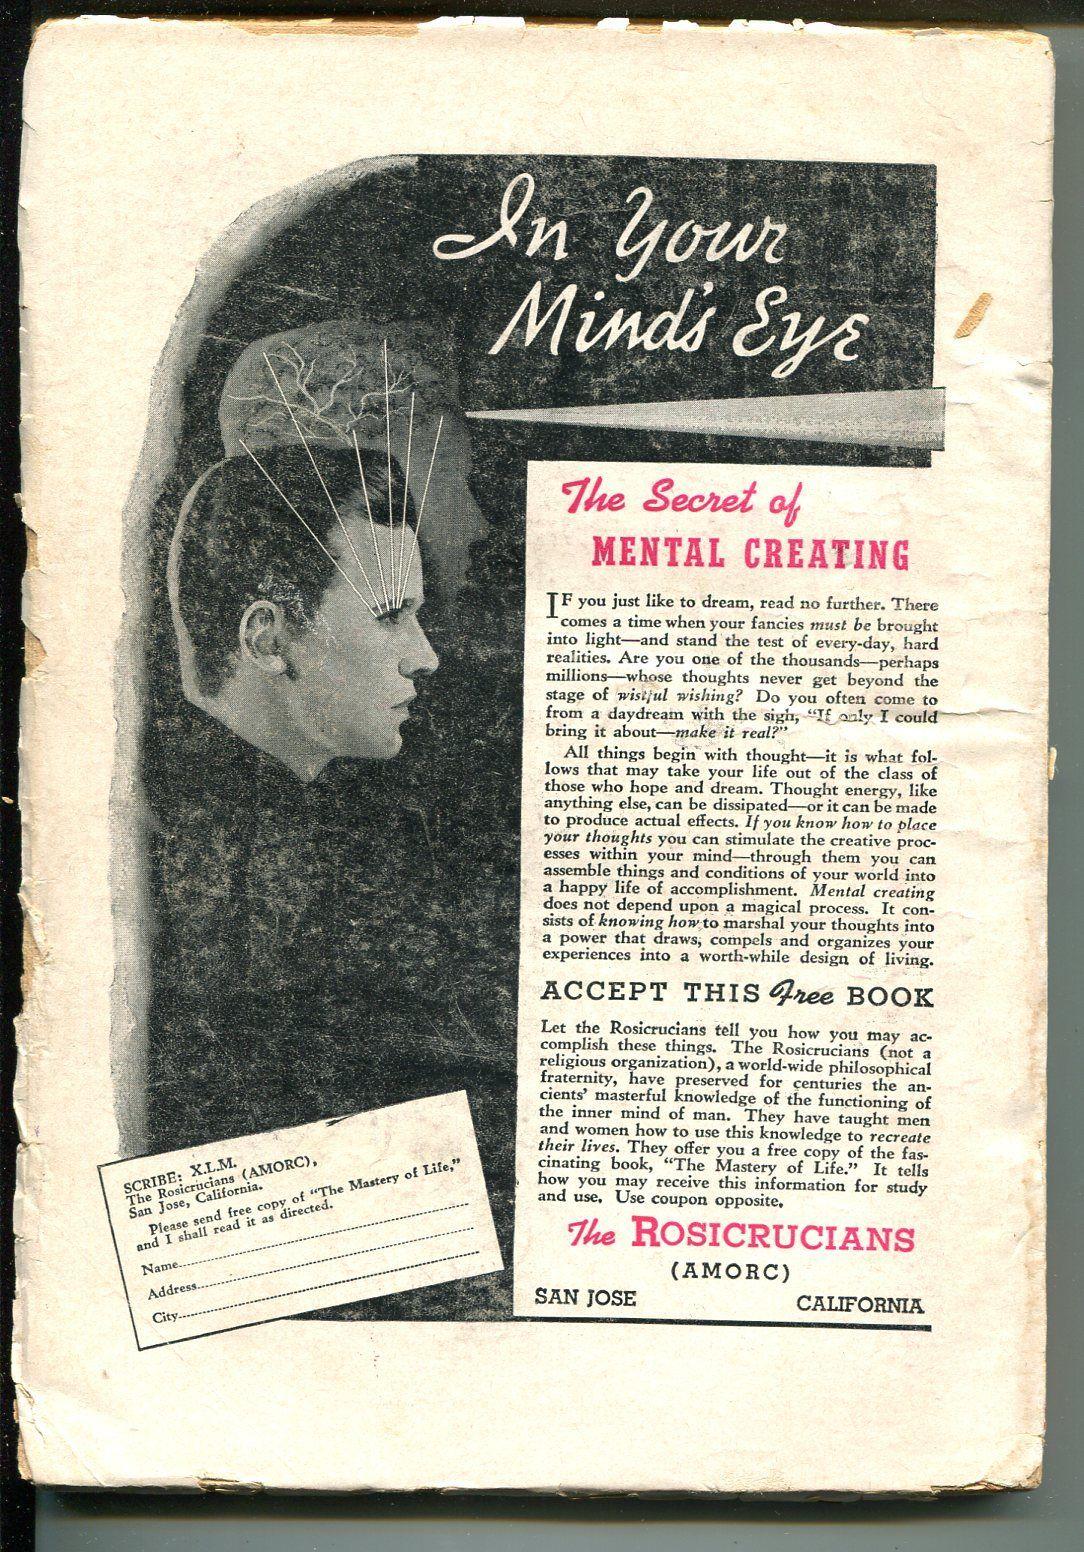 FANTASTIC ADVENTURES 1/1951-ZIFF-DAVIS-PULP SCI-FI-CLIFFORD